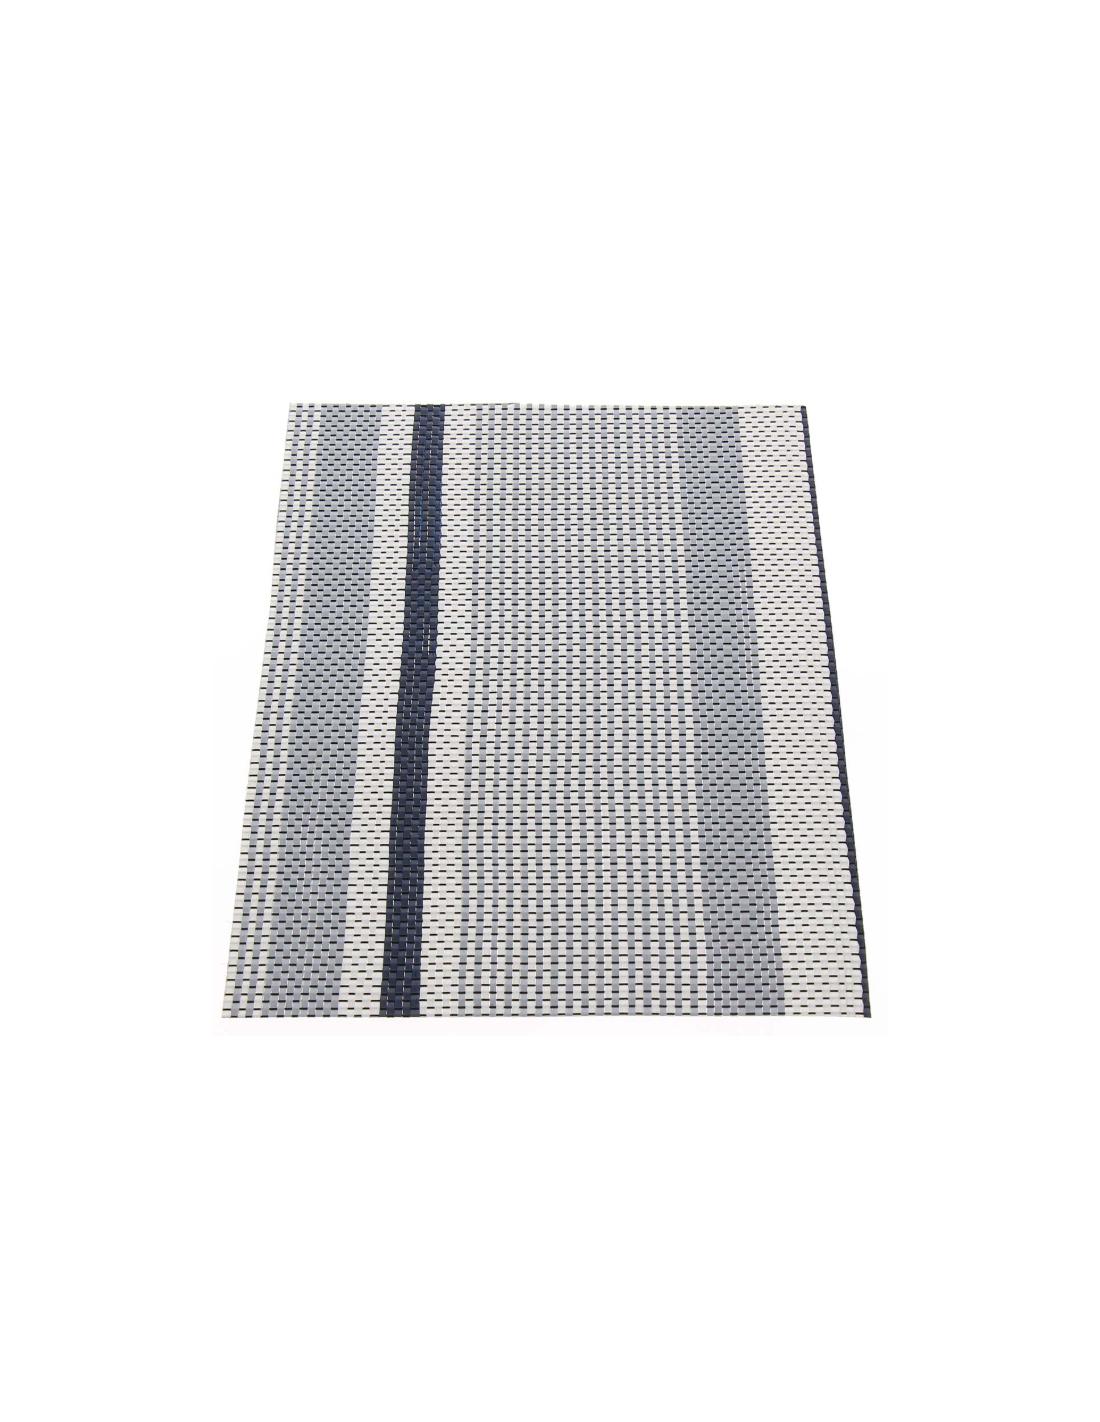 Alfombra Tapis de suelo 500 grm PVC 250x400 cm   Tienda de